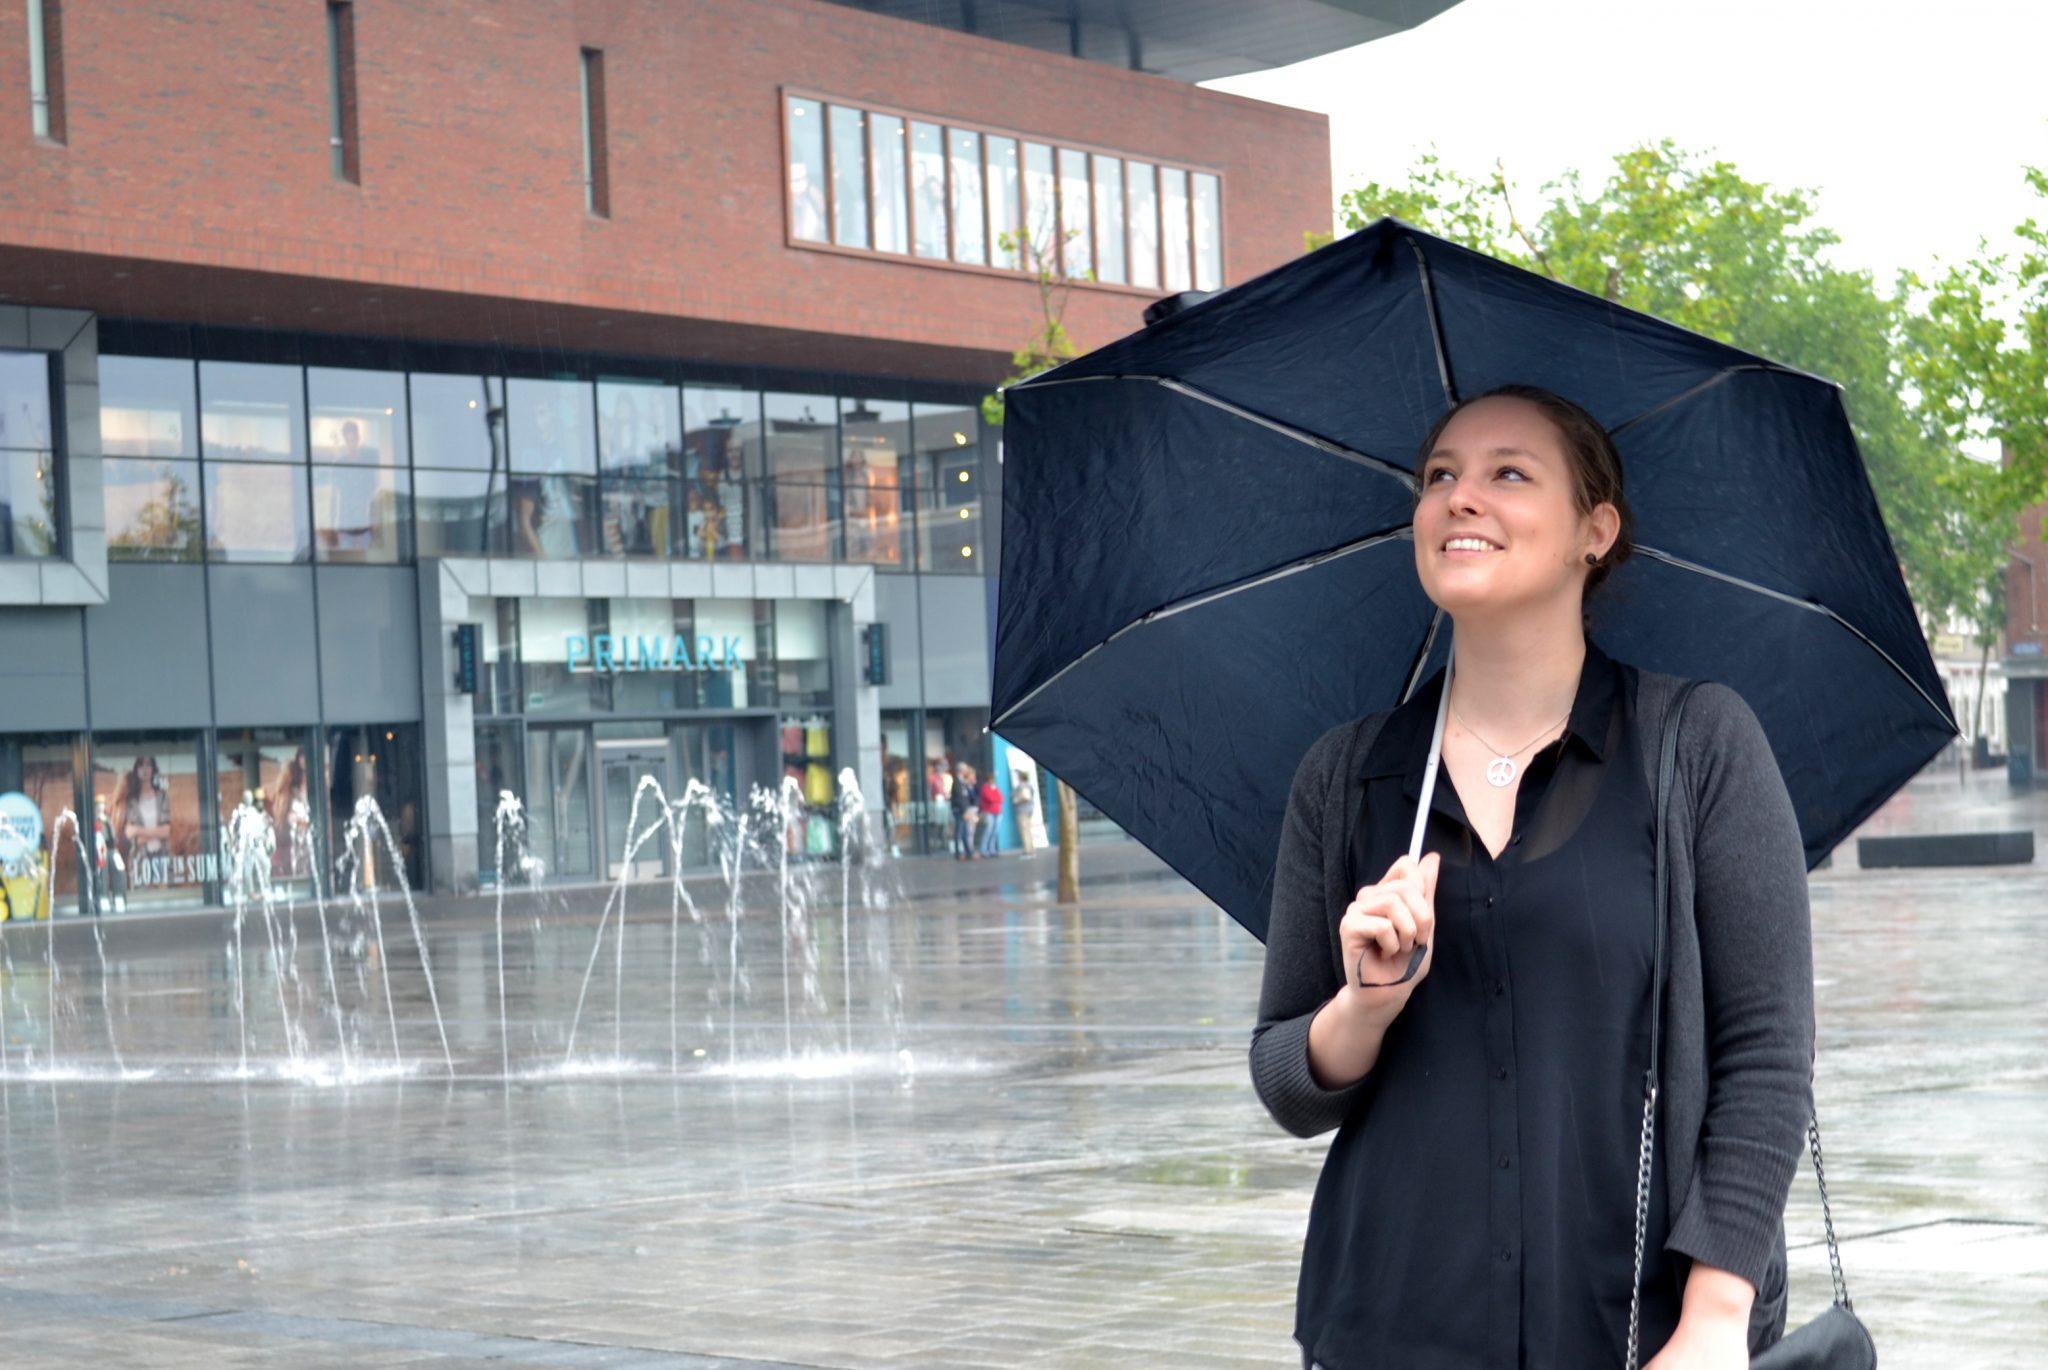 Outfit: Immer wenn es regnet - DSC 0417